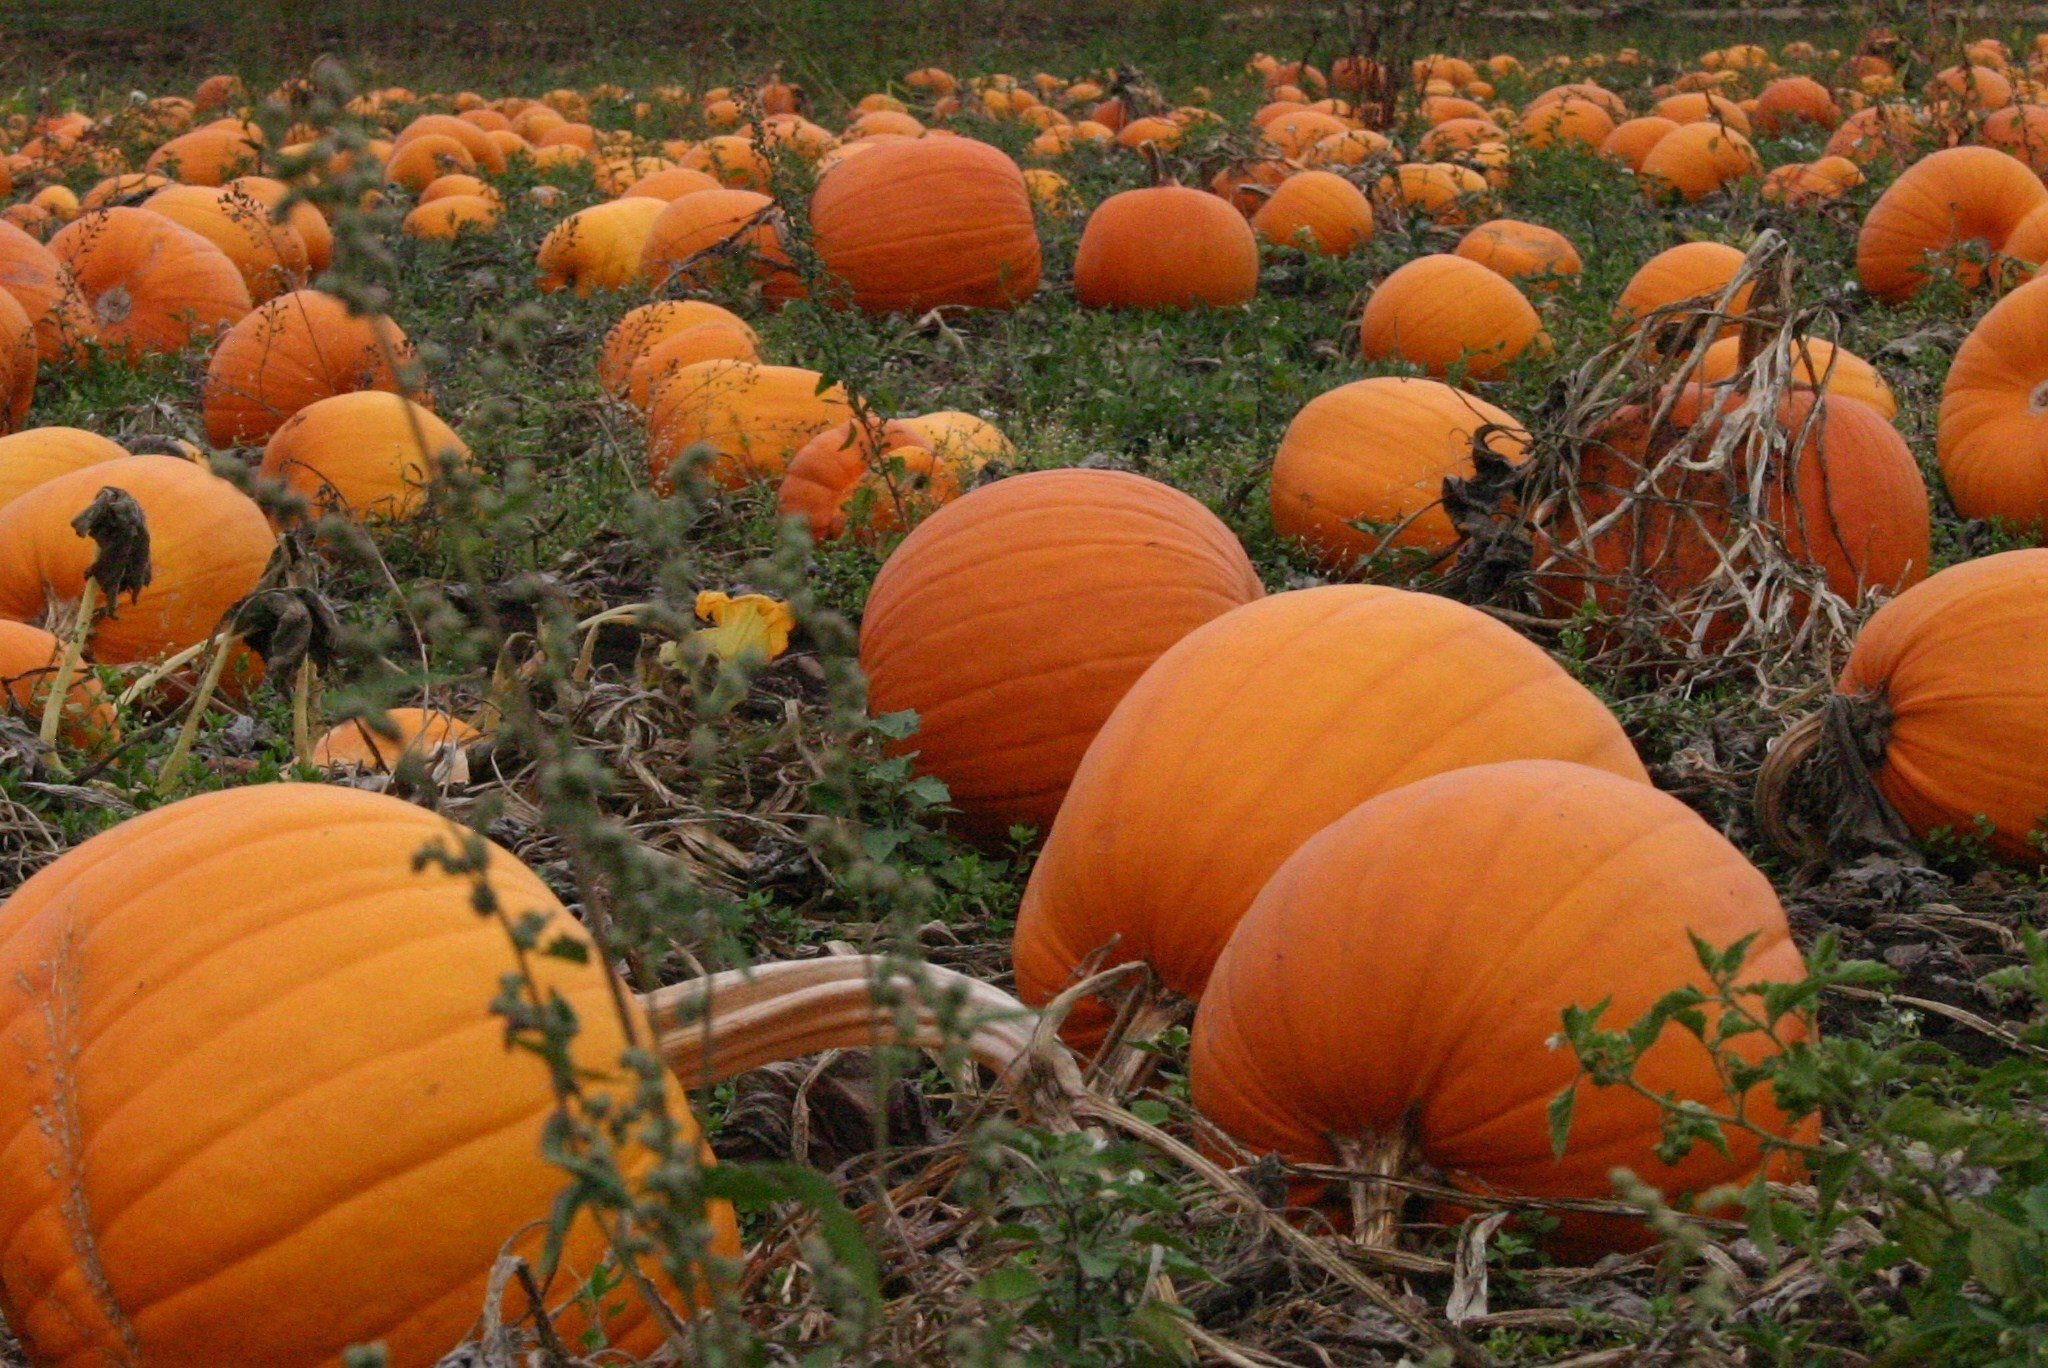 autumn pumpkins desktop wallpaper 50 images